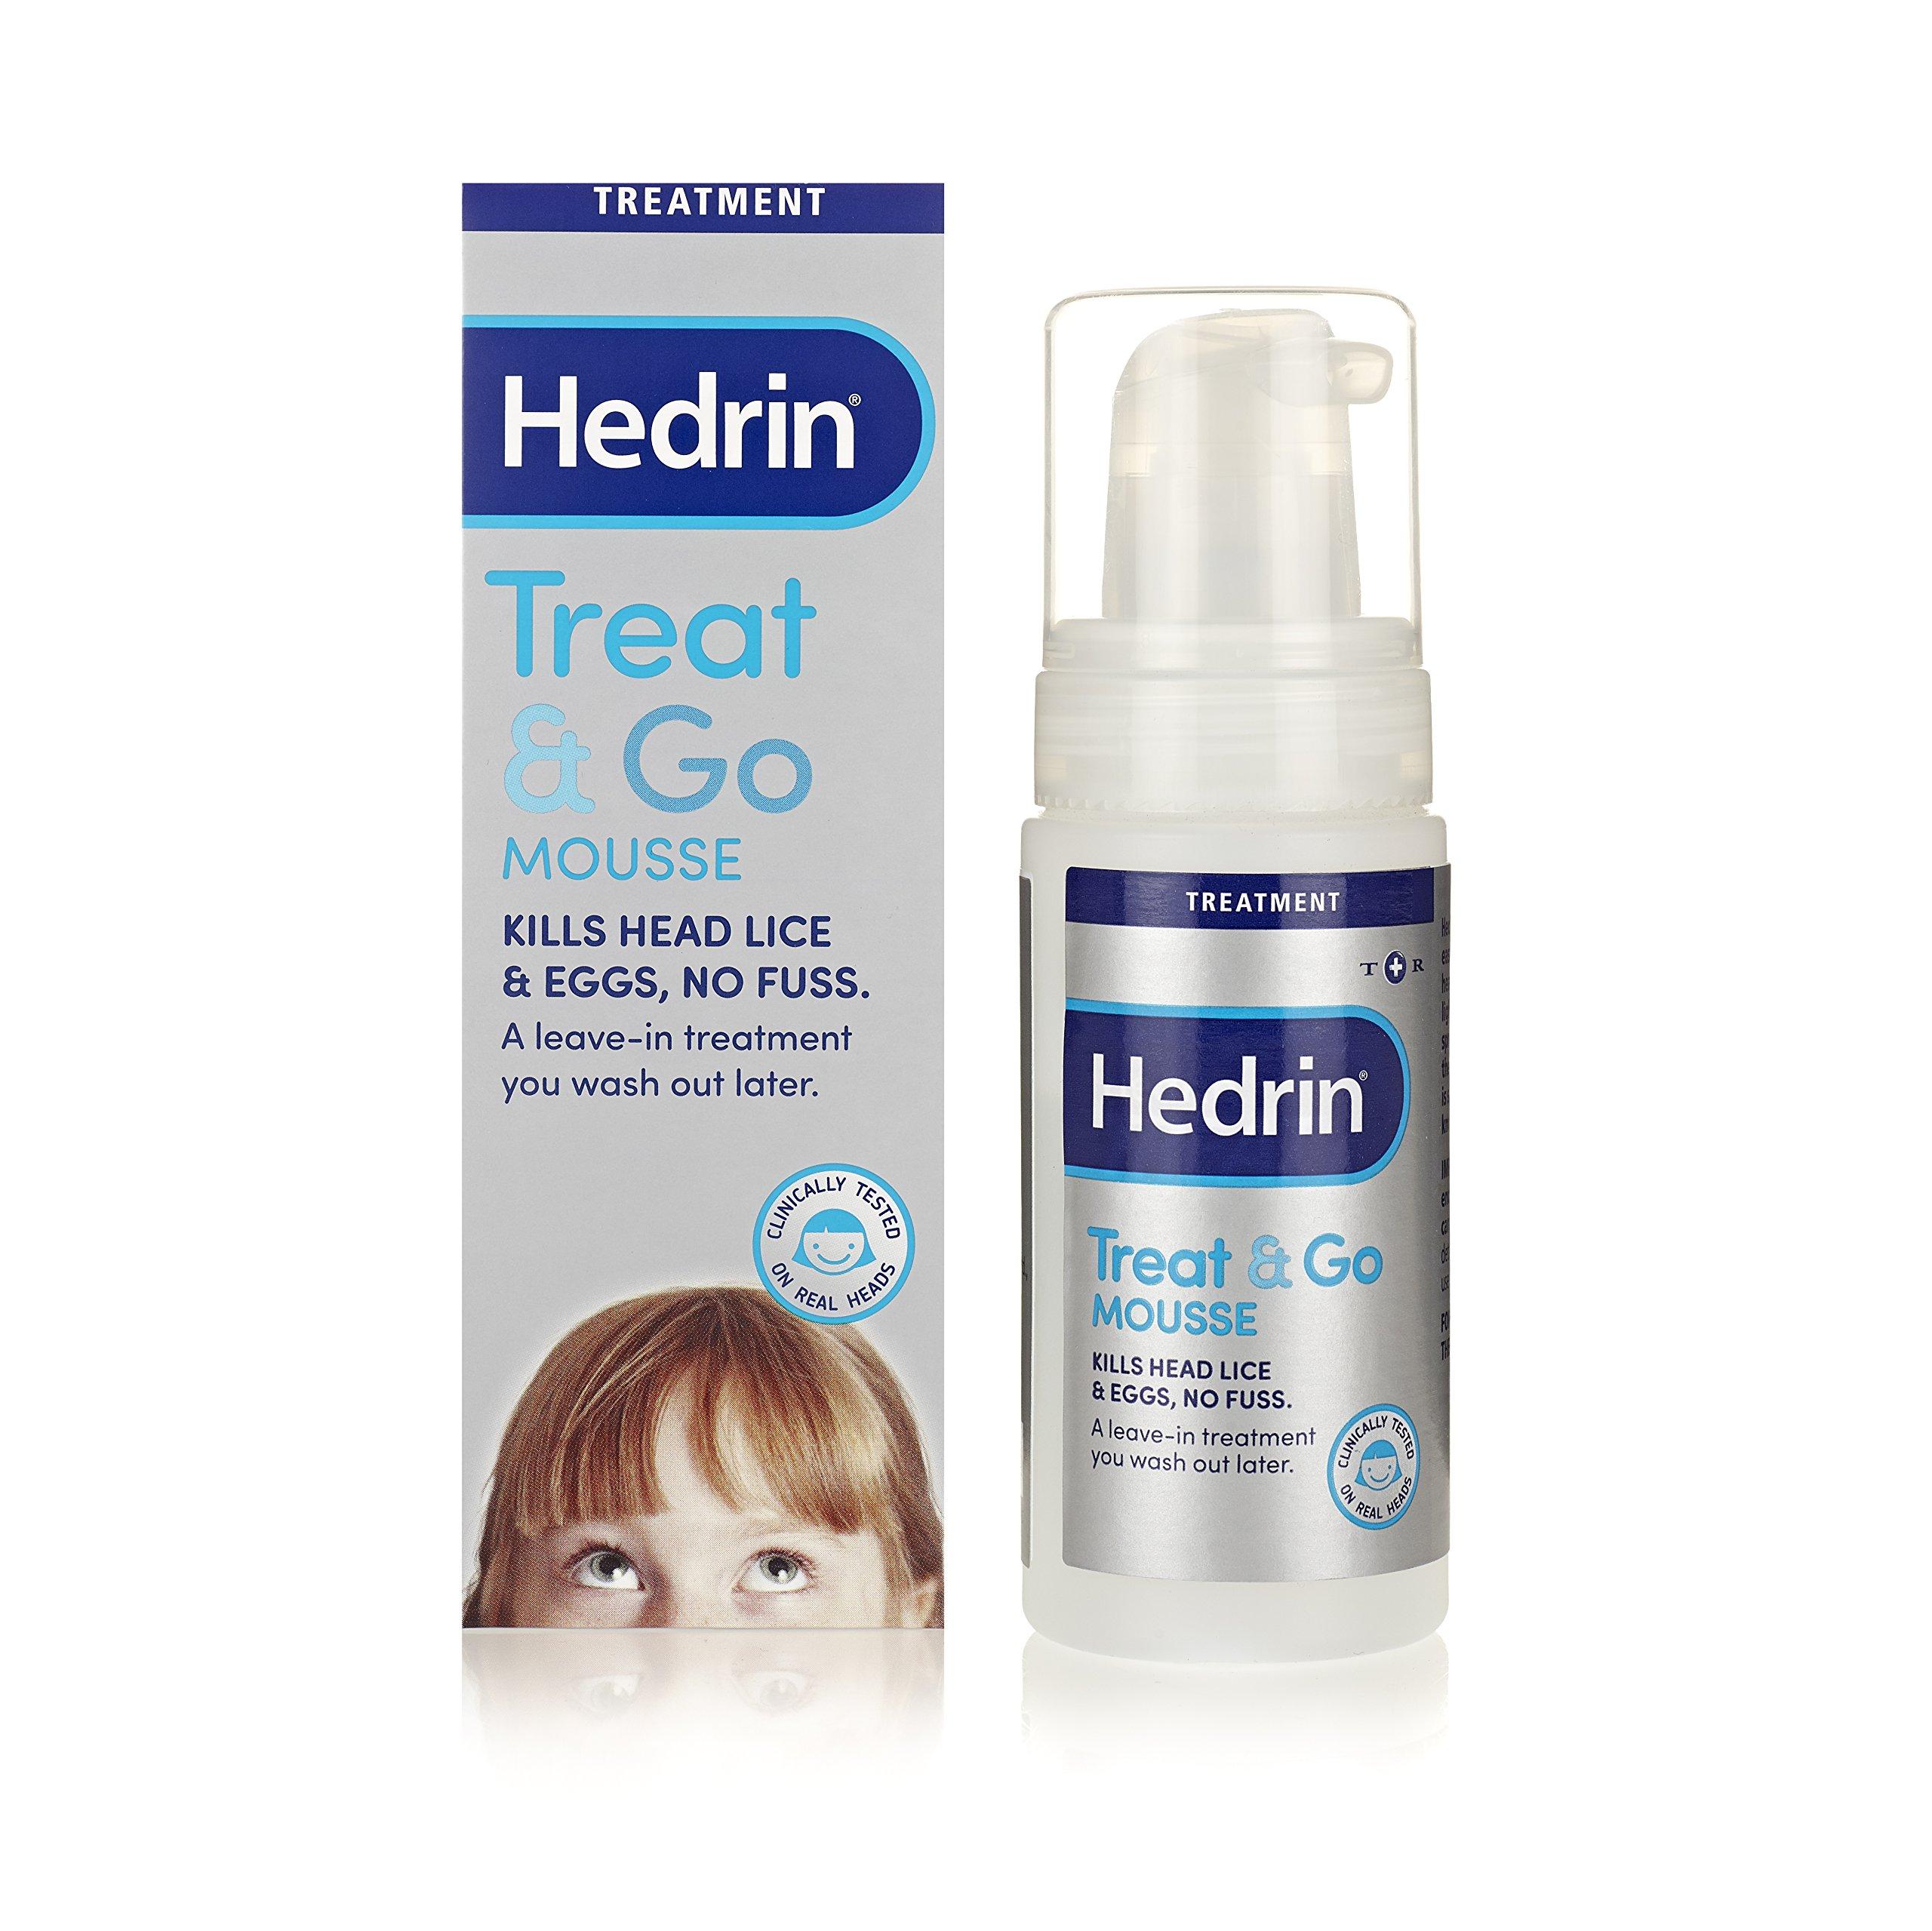 Hedrin Treat & Go Mousse - Fuss Free Head Lice Treatment 100ml